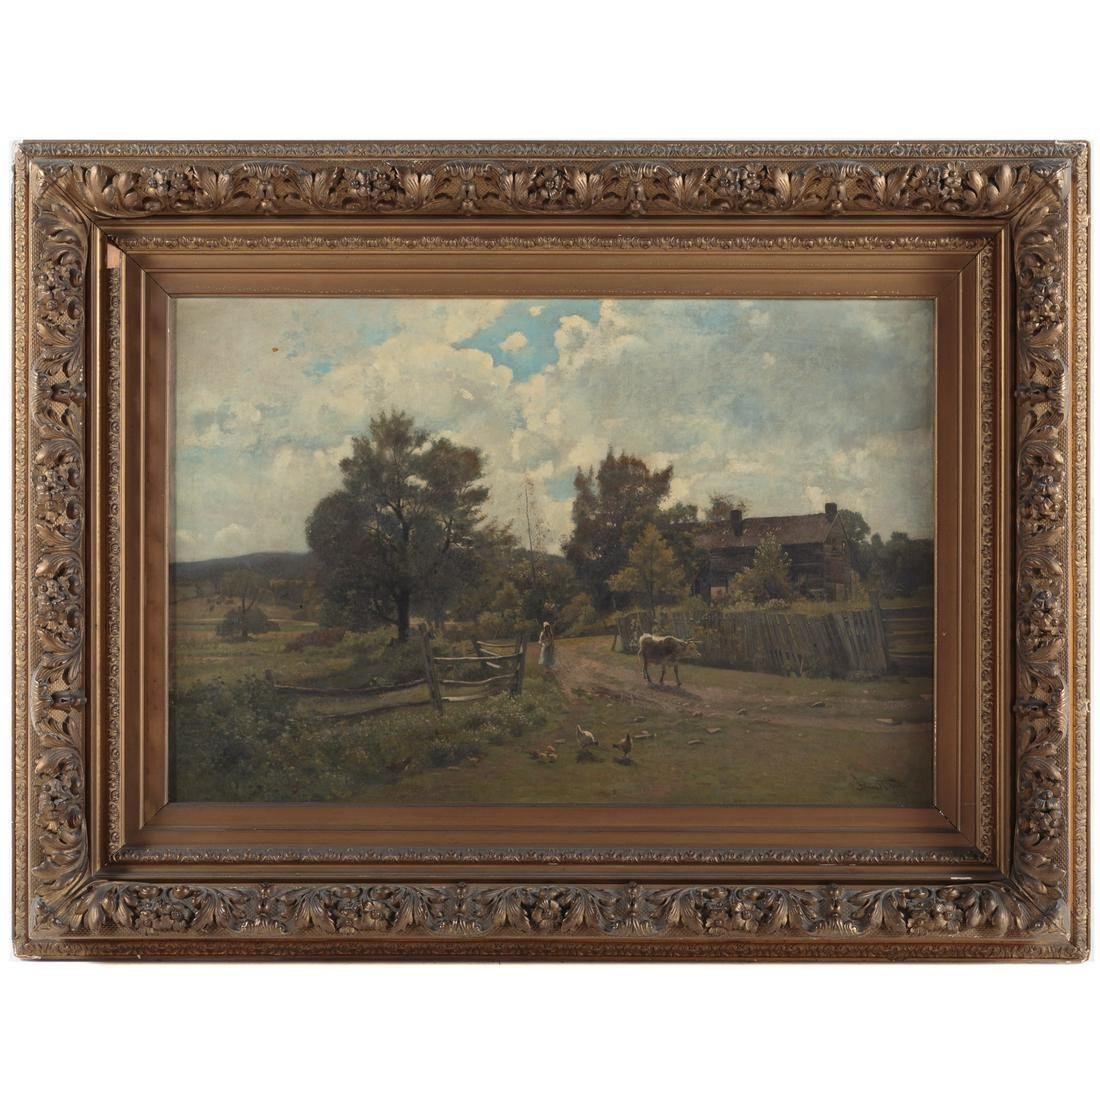 John Robinson Tait. Pastoral Landscape